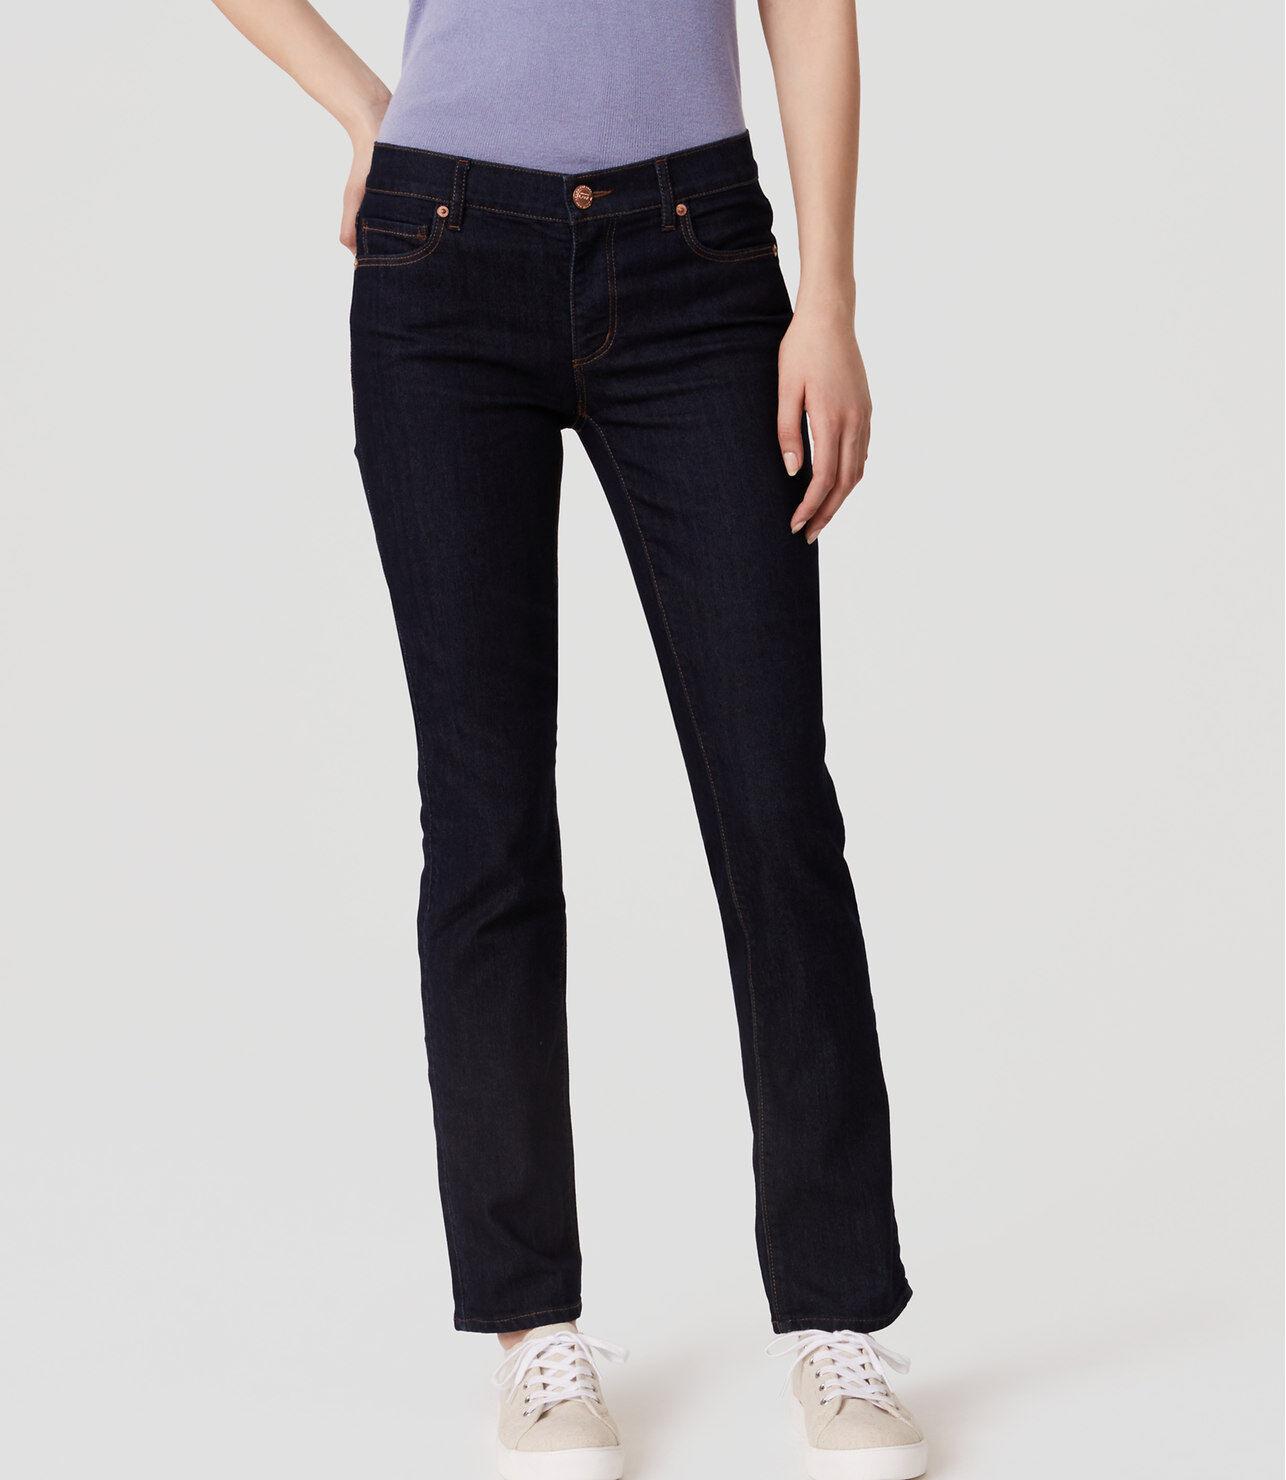 Ann Taylor LOFT Curvy Straight Leg Jeans Pants in Dark Rinse Wash 28 6 Petite